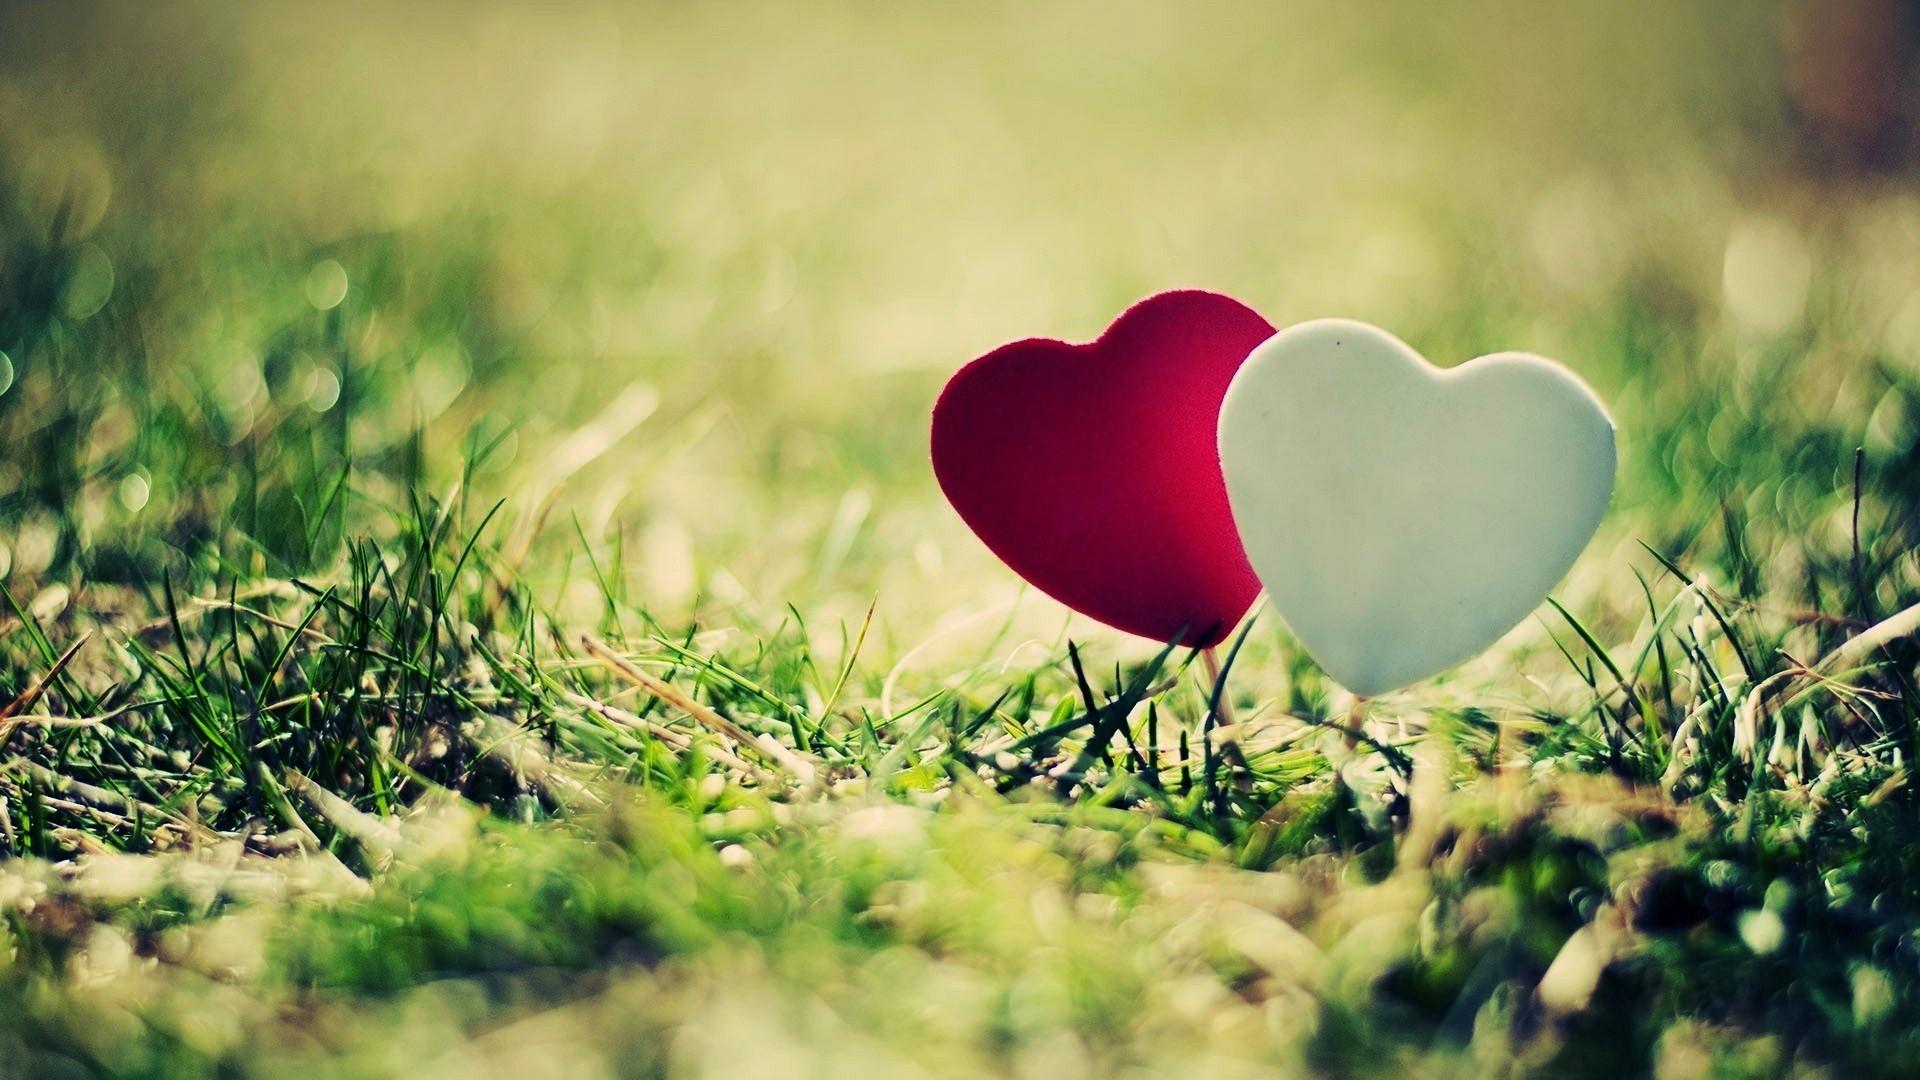 Love Heart Wallpapers Hd Wallpaper 1920x1080